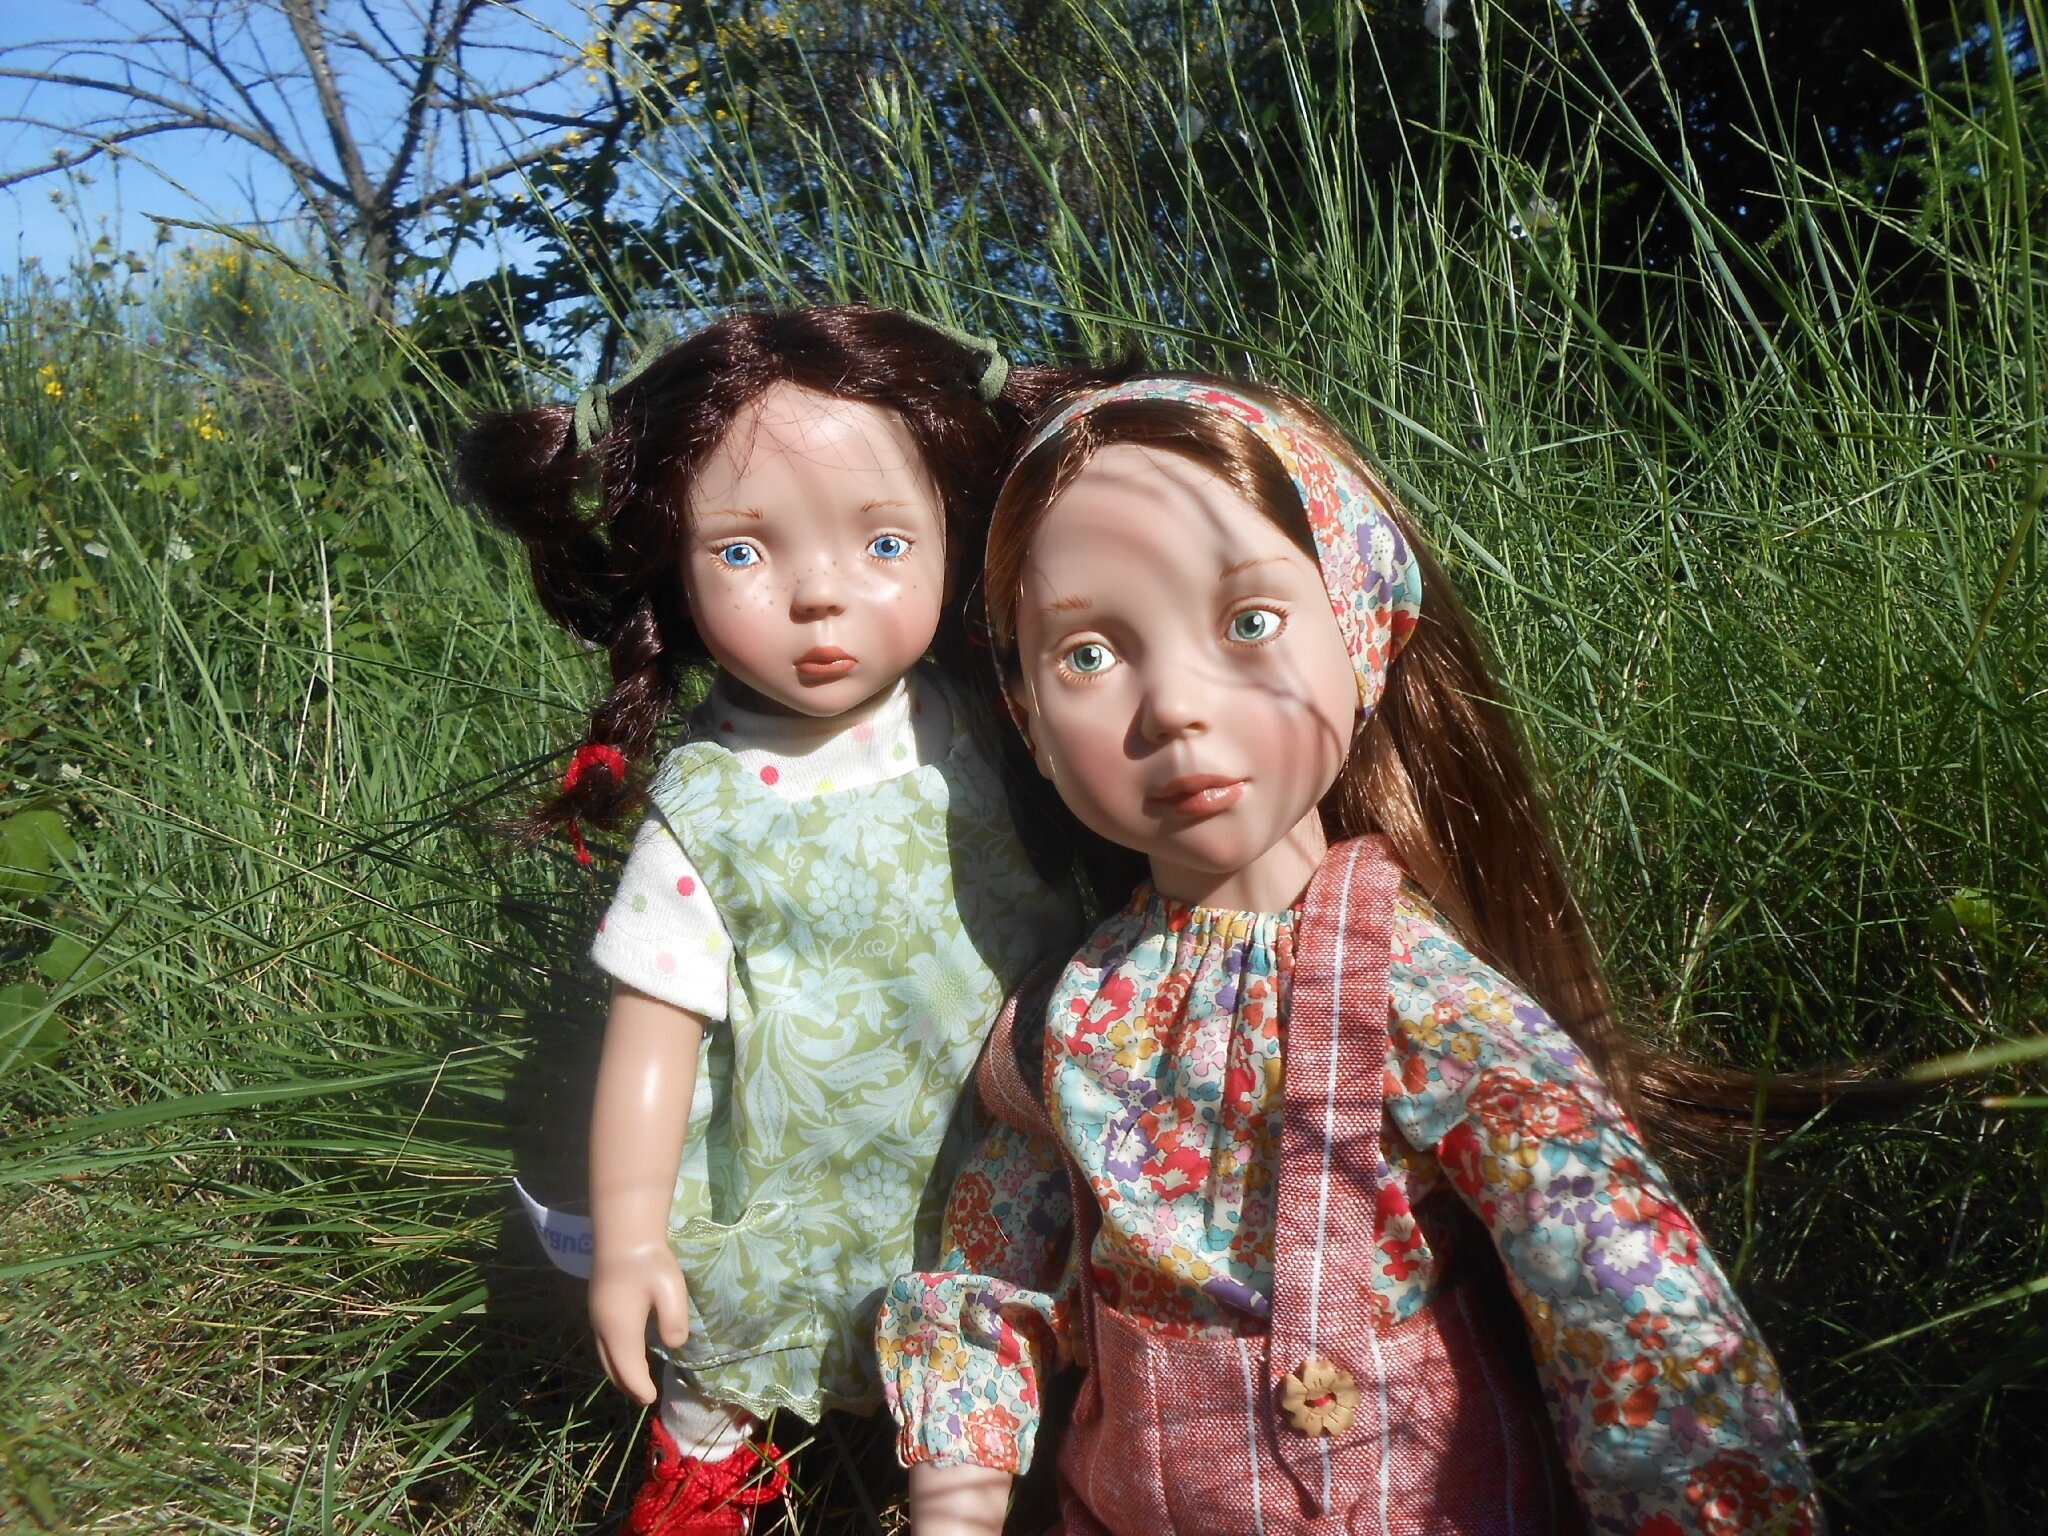 Eglantine et Lilas